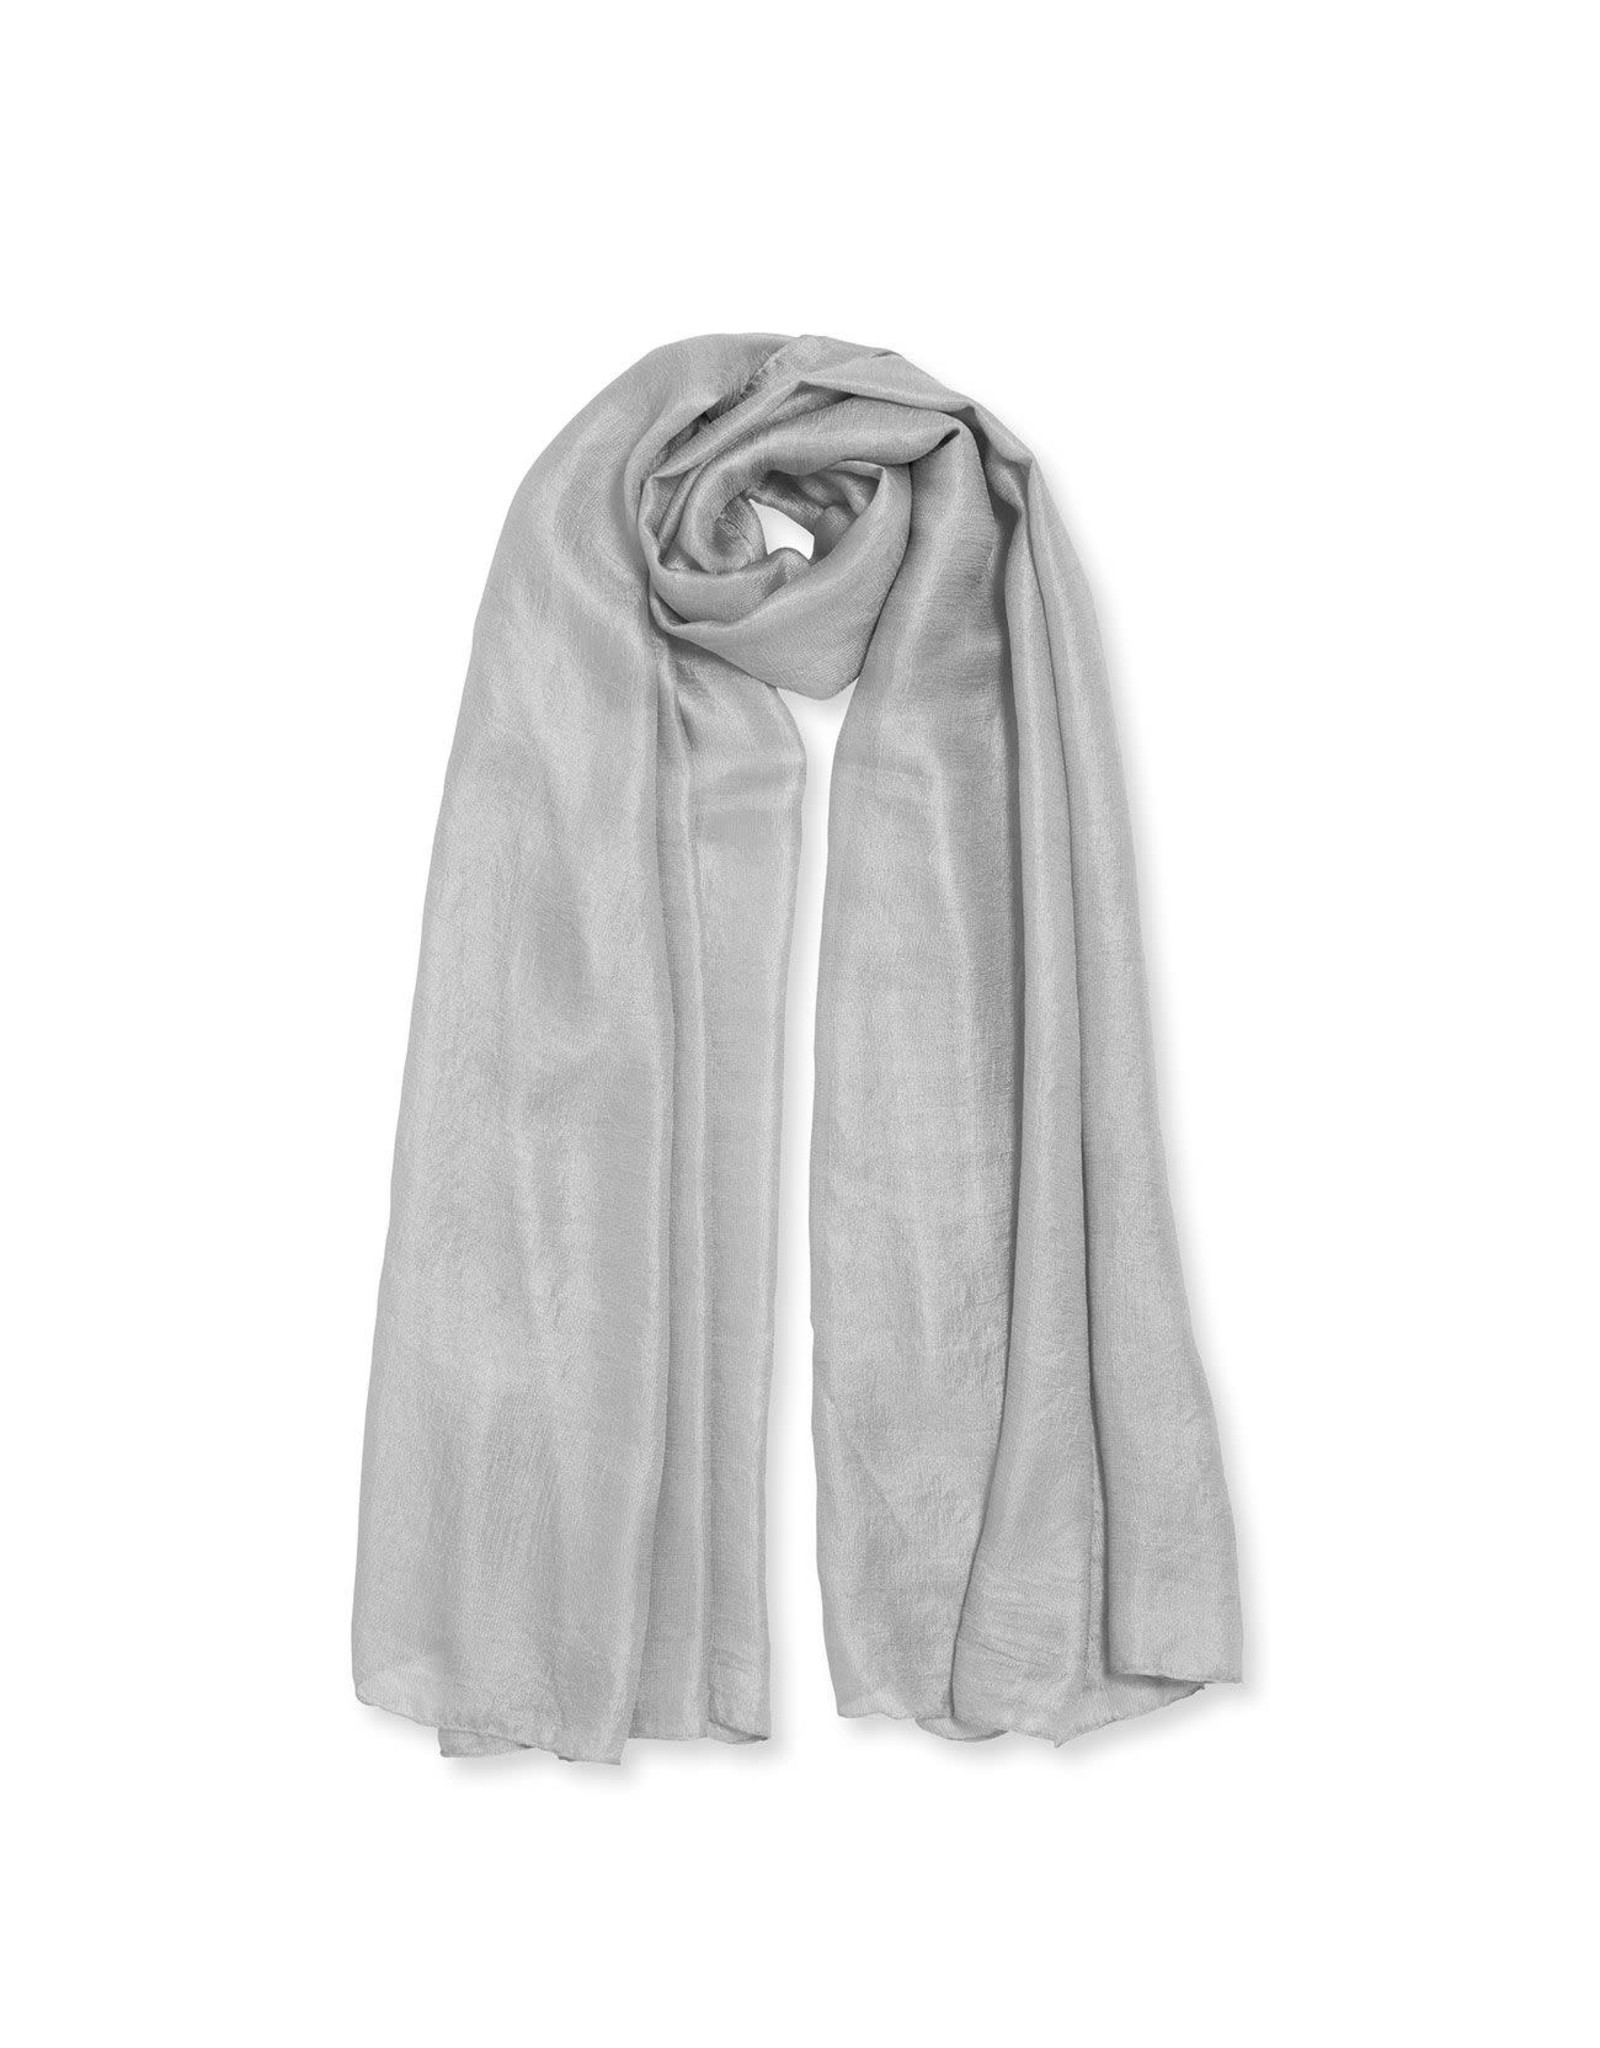 Katie Loxton Wrapped up in Love - Sjaal Grijs